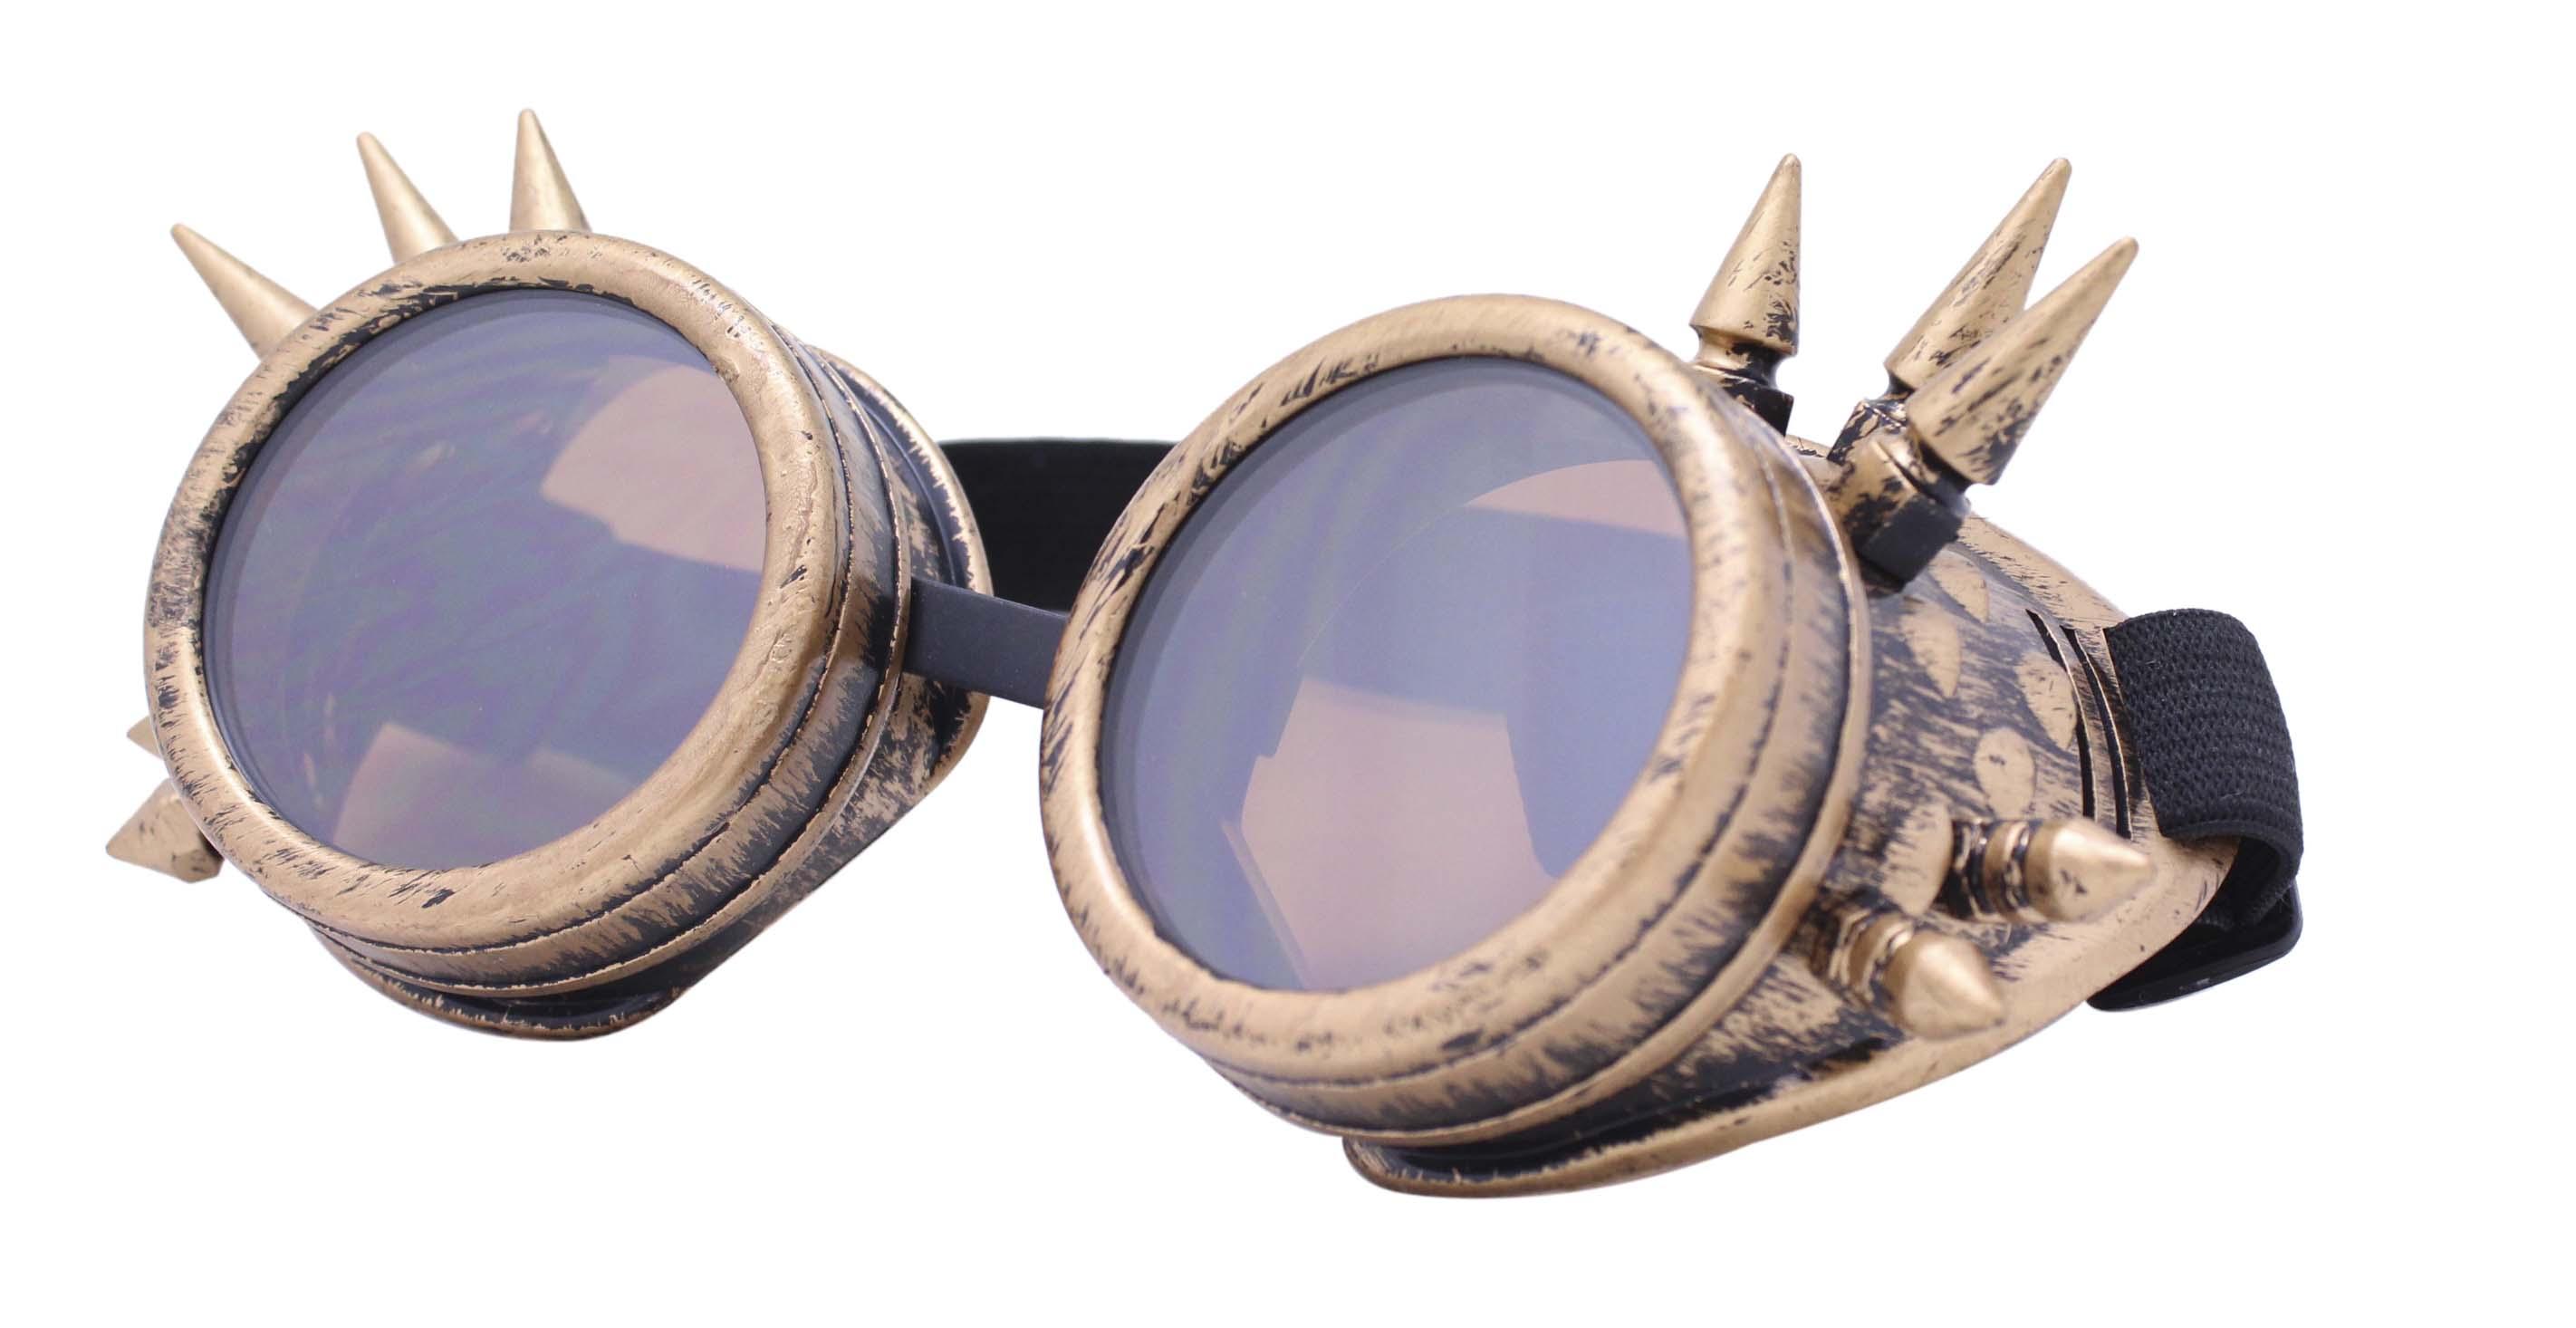 Steampunk Goggles Sunglasses Wholesale, Wholesaler London, UK